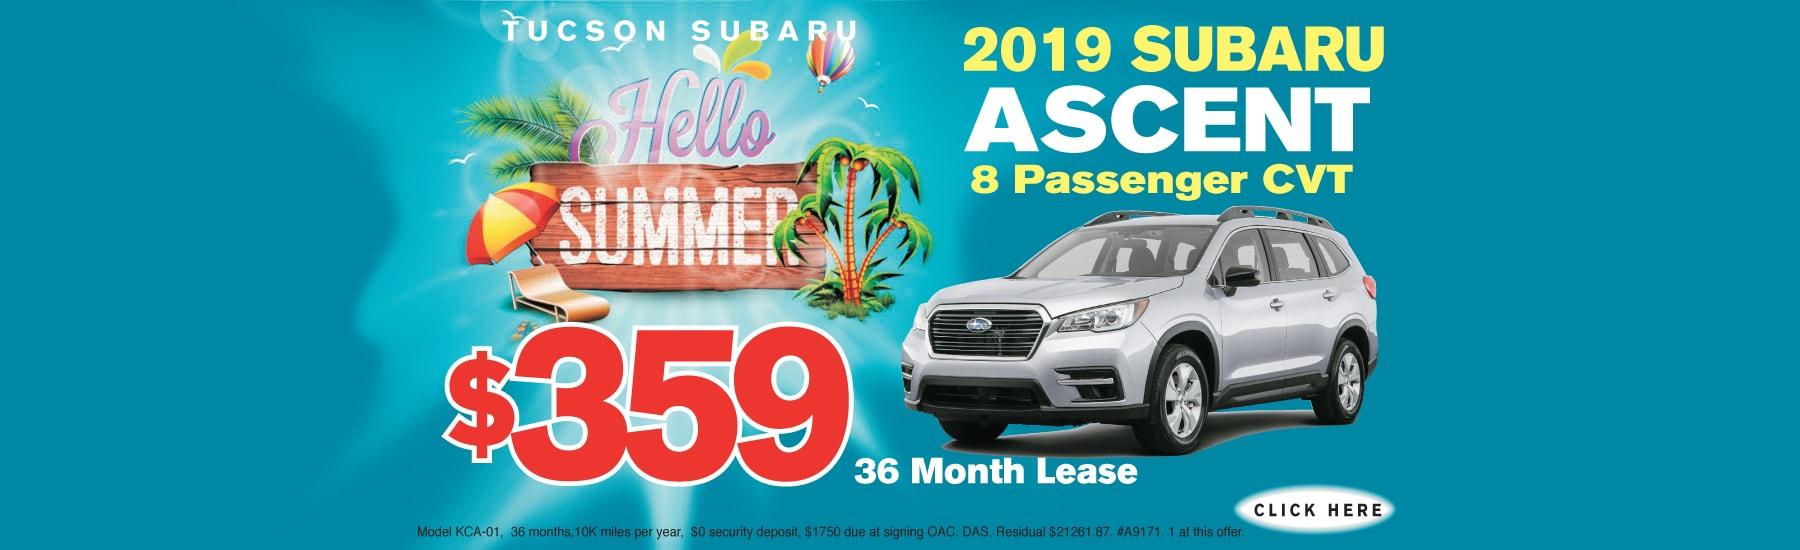 Jim Click Used Cars >> Tucson Subaru New Subaru Used Car Dealership Serving Oro Valley